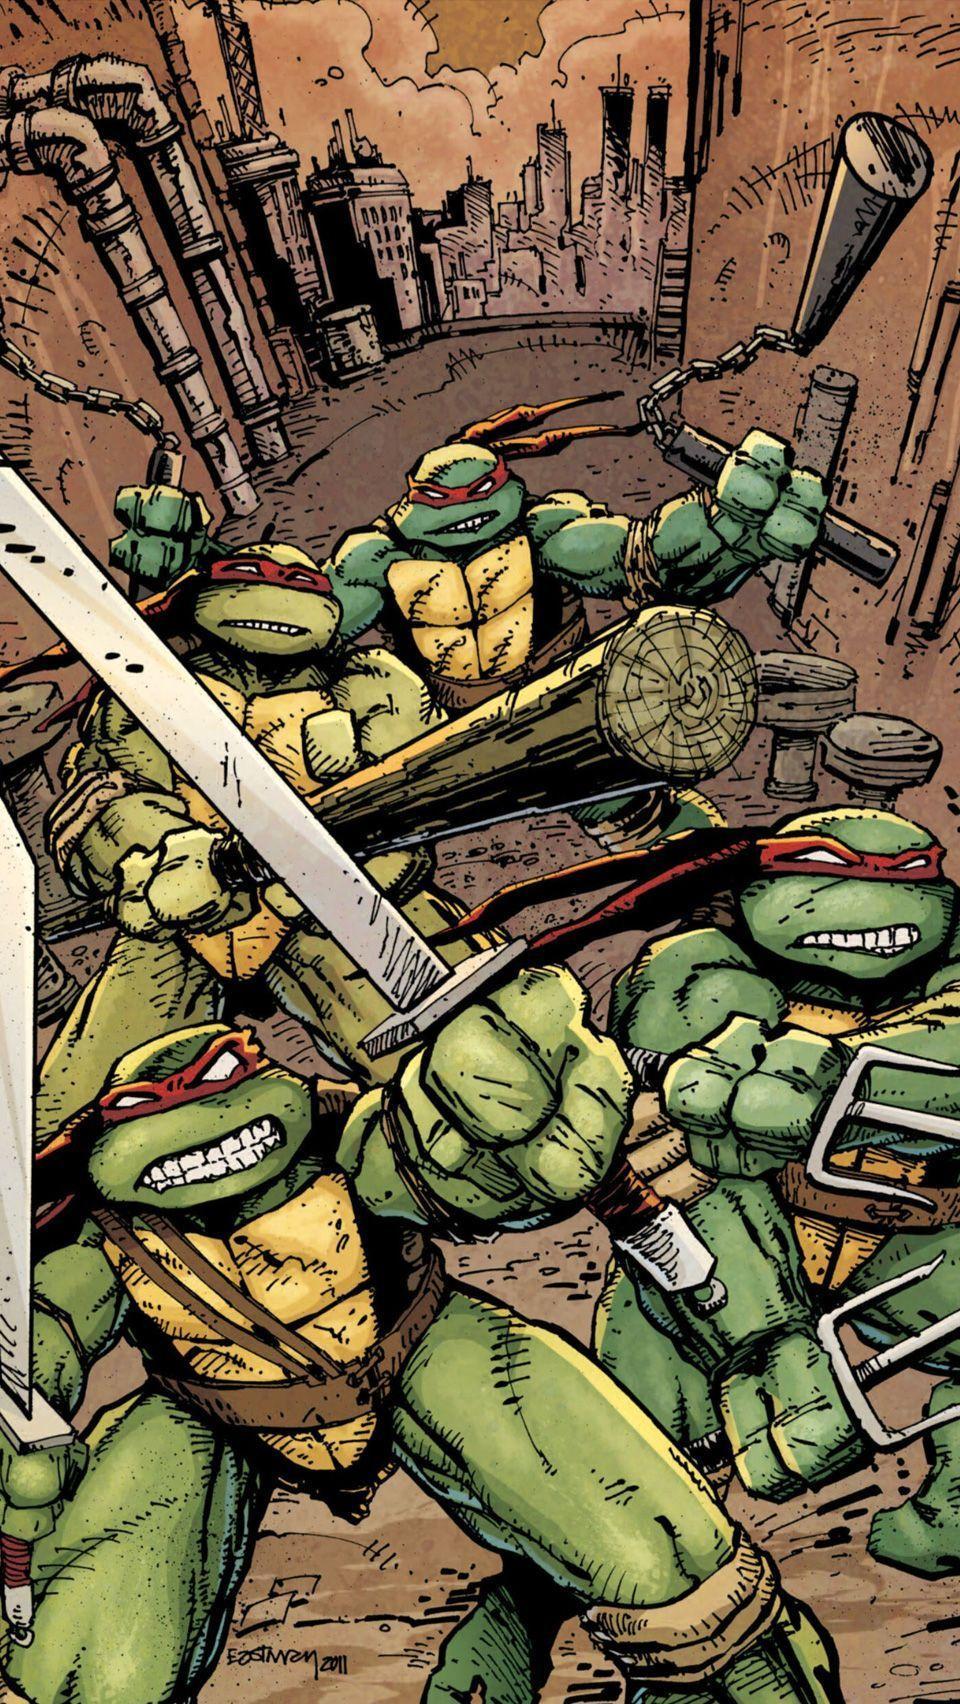 1980s teenage mutant ninja turtles wallpapers top free 1980s teenage mutant ninja turtles - Ninja turtles wallpaper ...